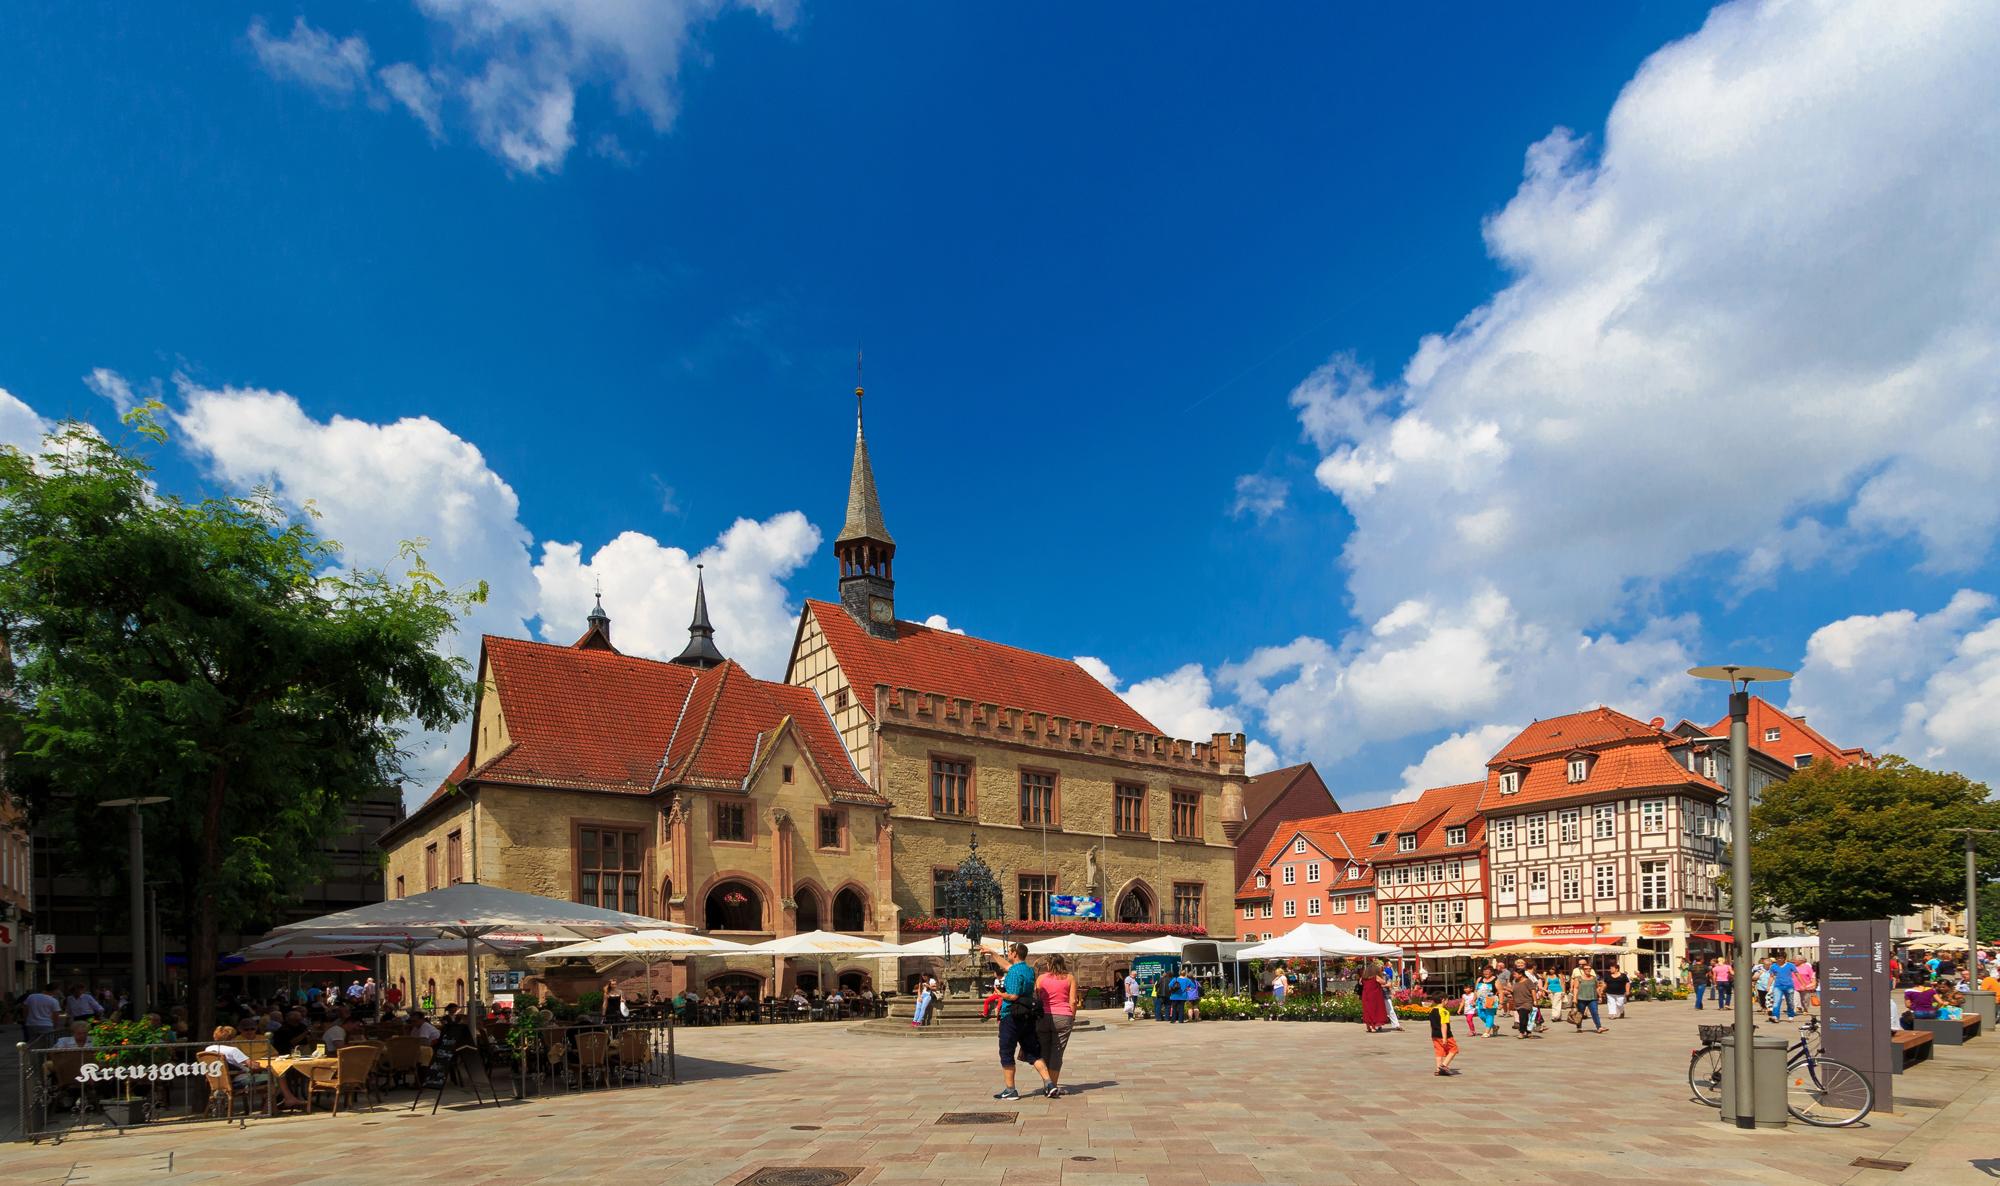 Das alte Rathaus in Göttingen. Foto: Göttingen Tourismus e.V.